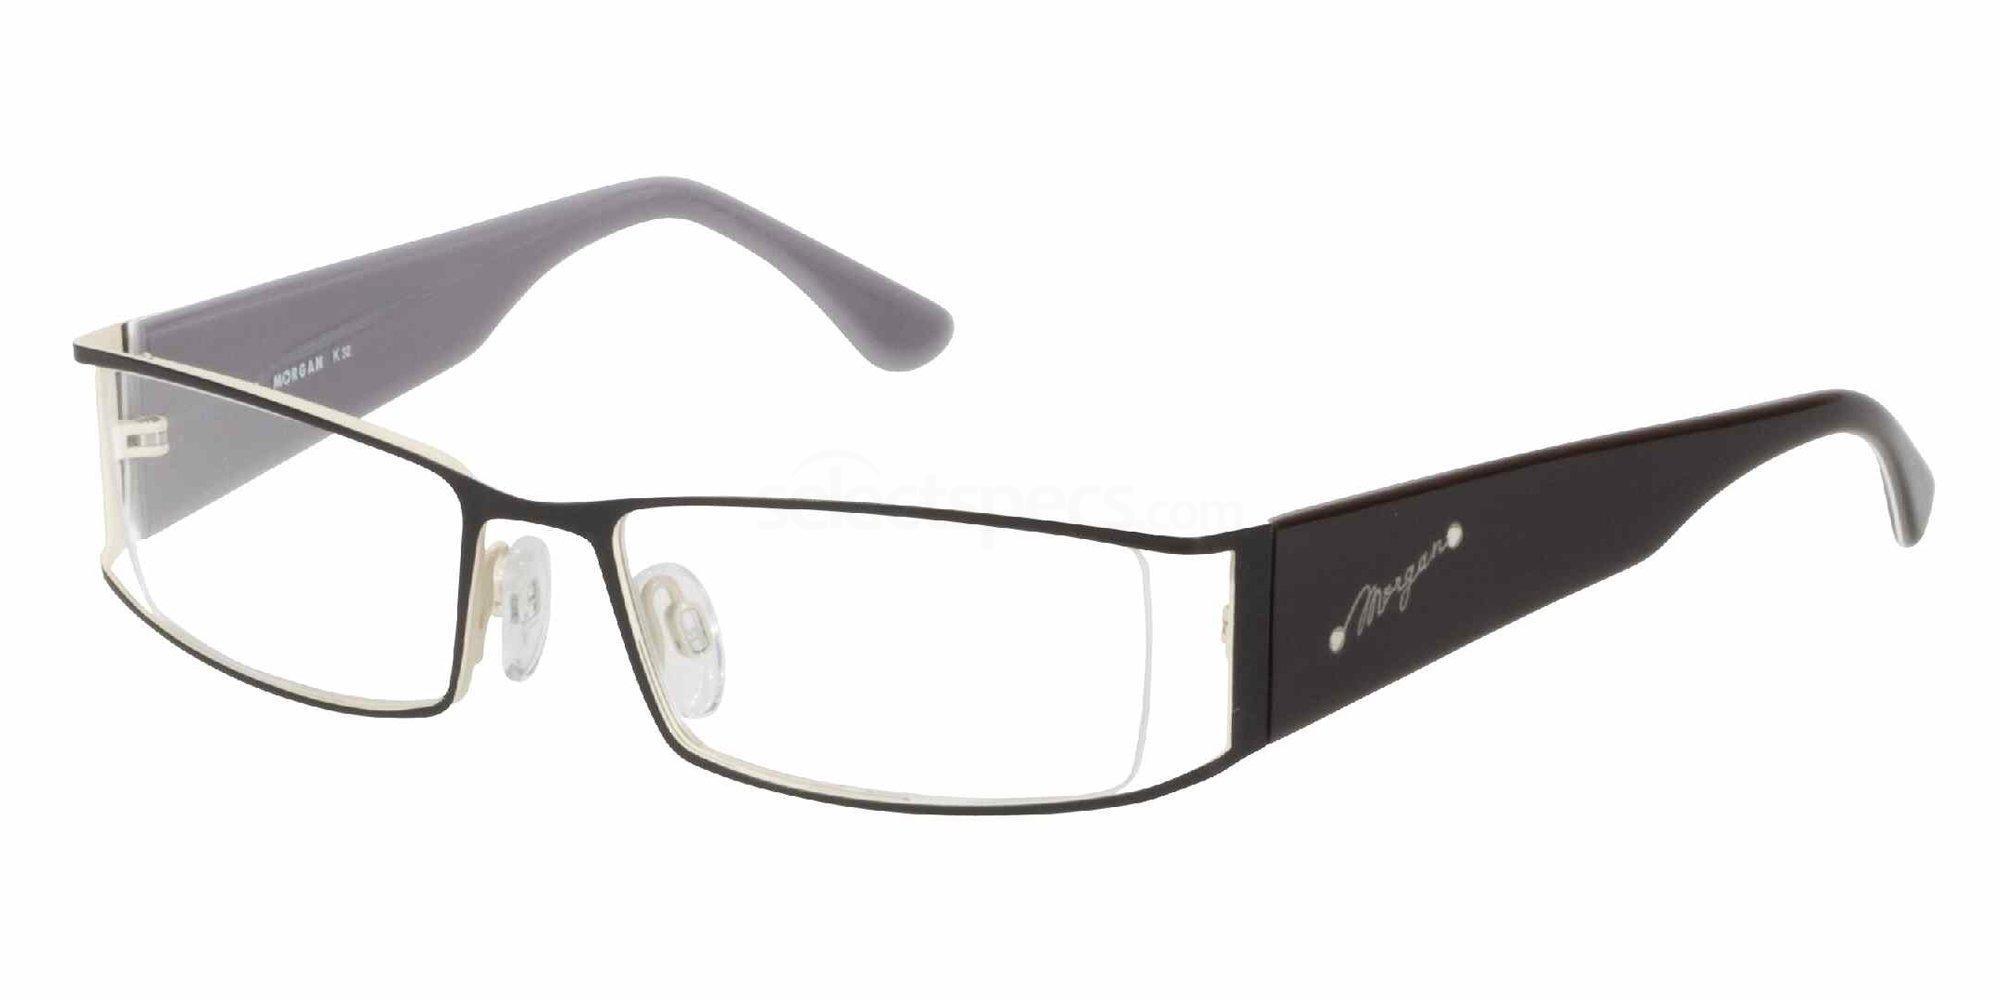 373 203104 Glasses, MORGAN Eyewear